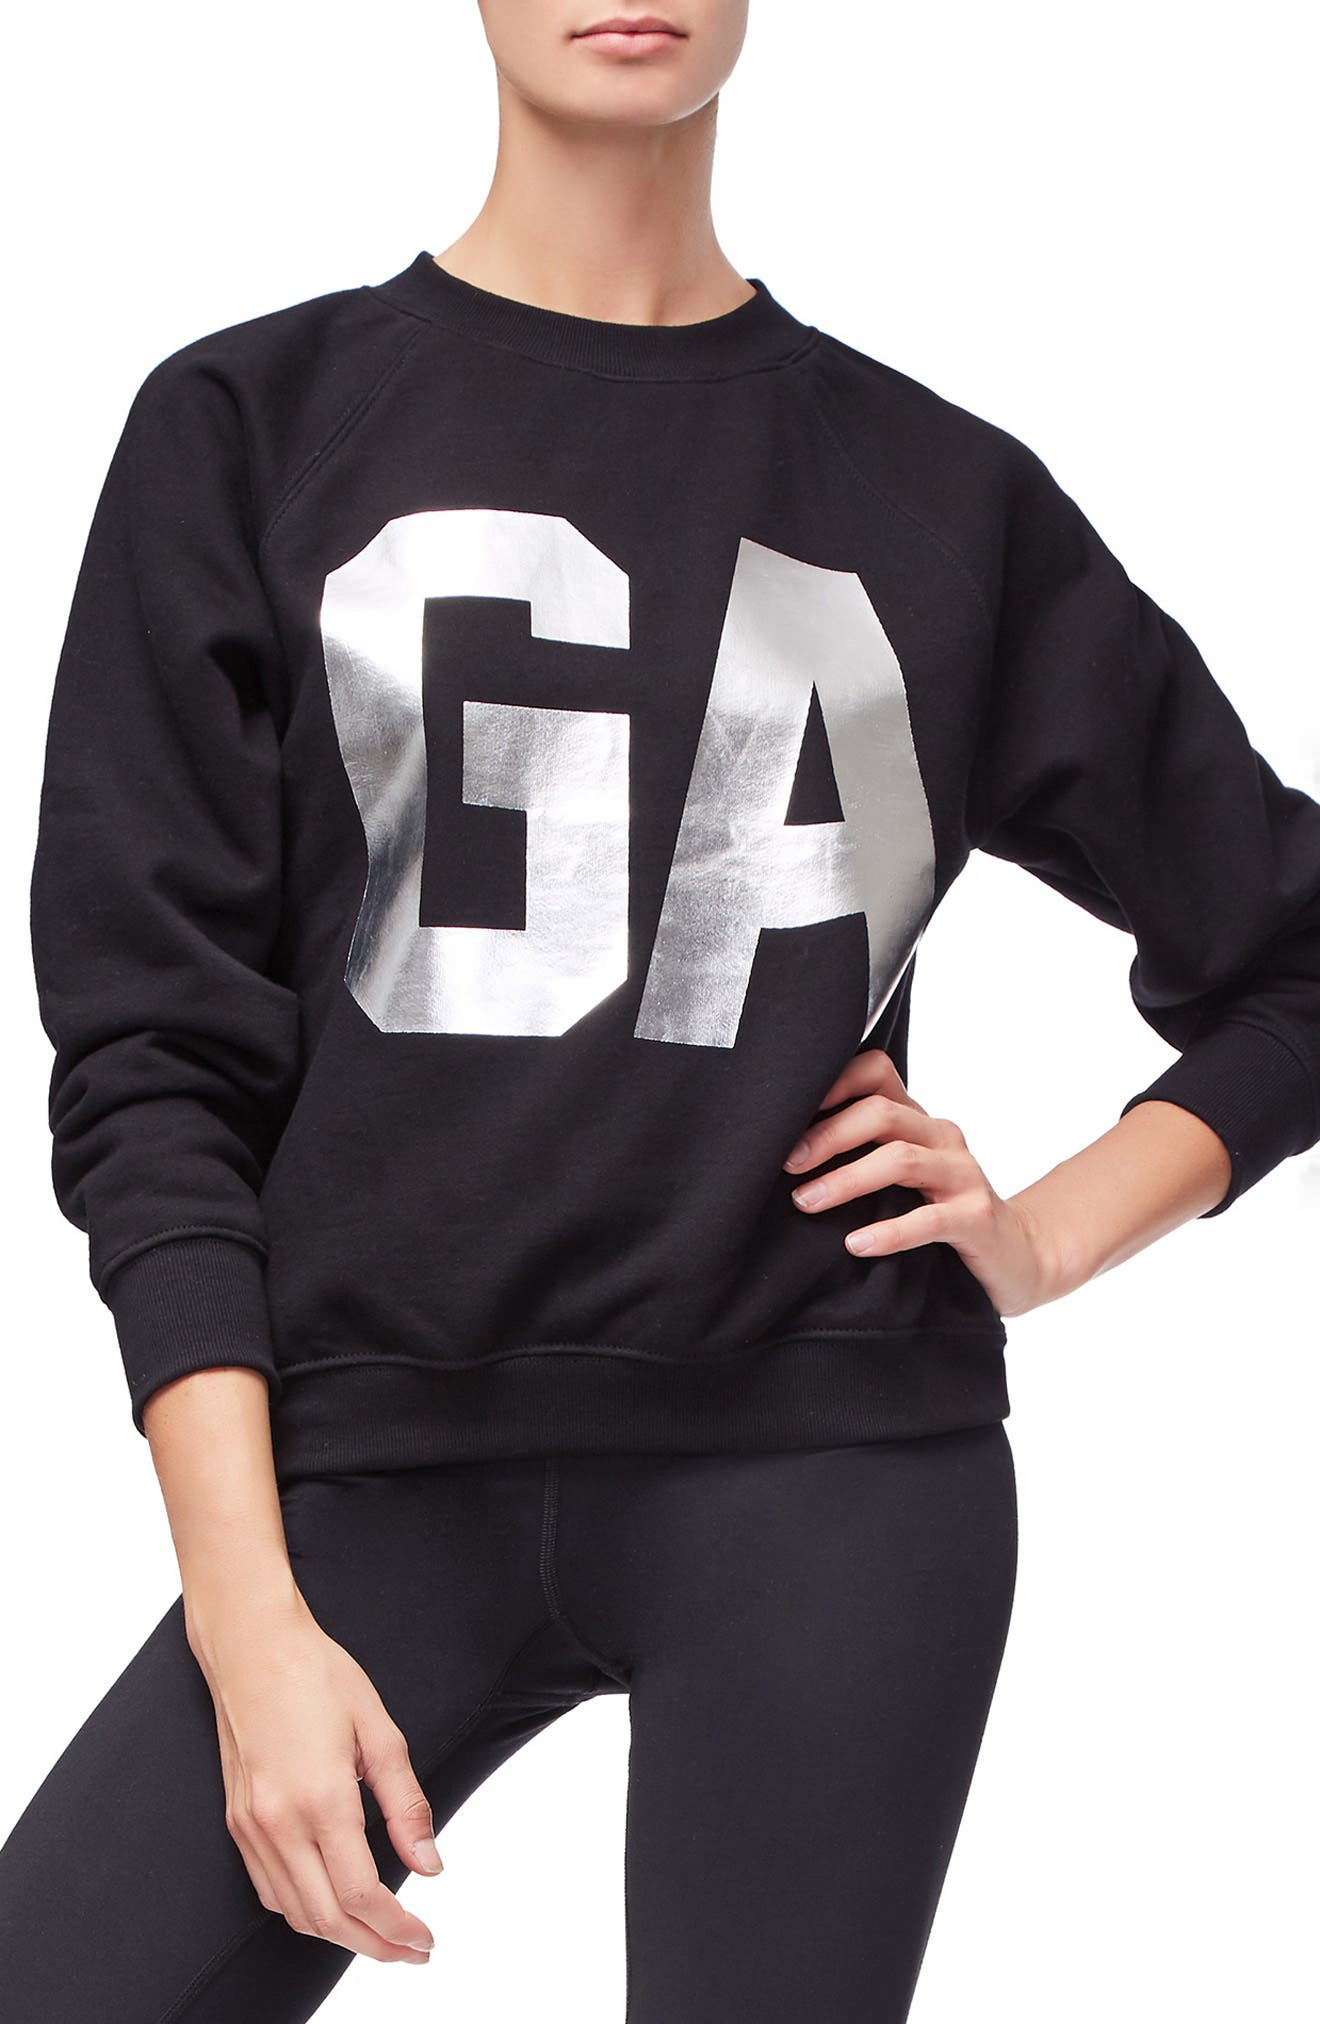 Goodies Varsity Sweatshirt,                             Main thumbnail 1, color,                             BLACK002